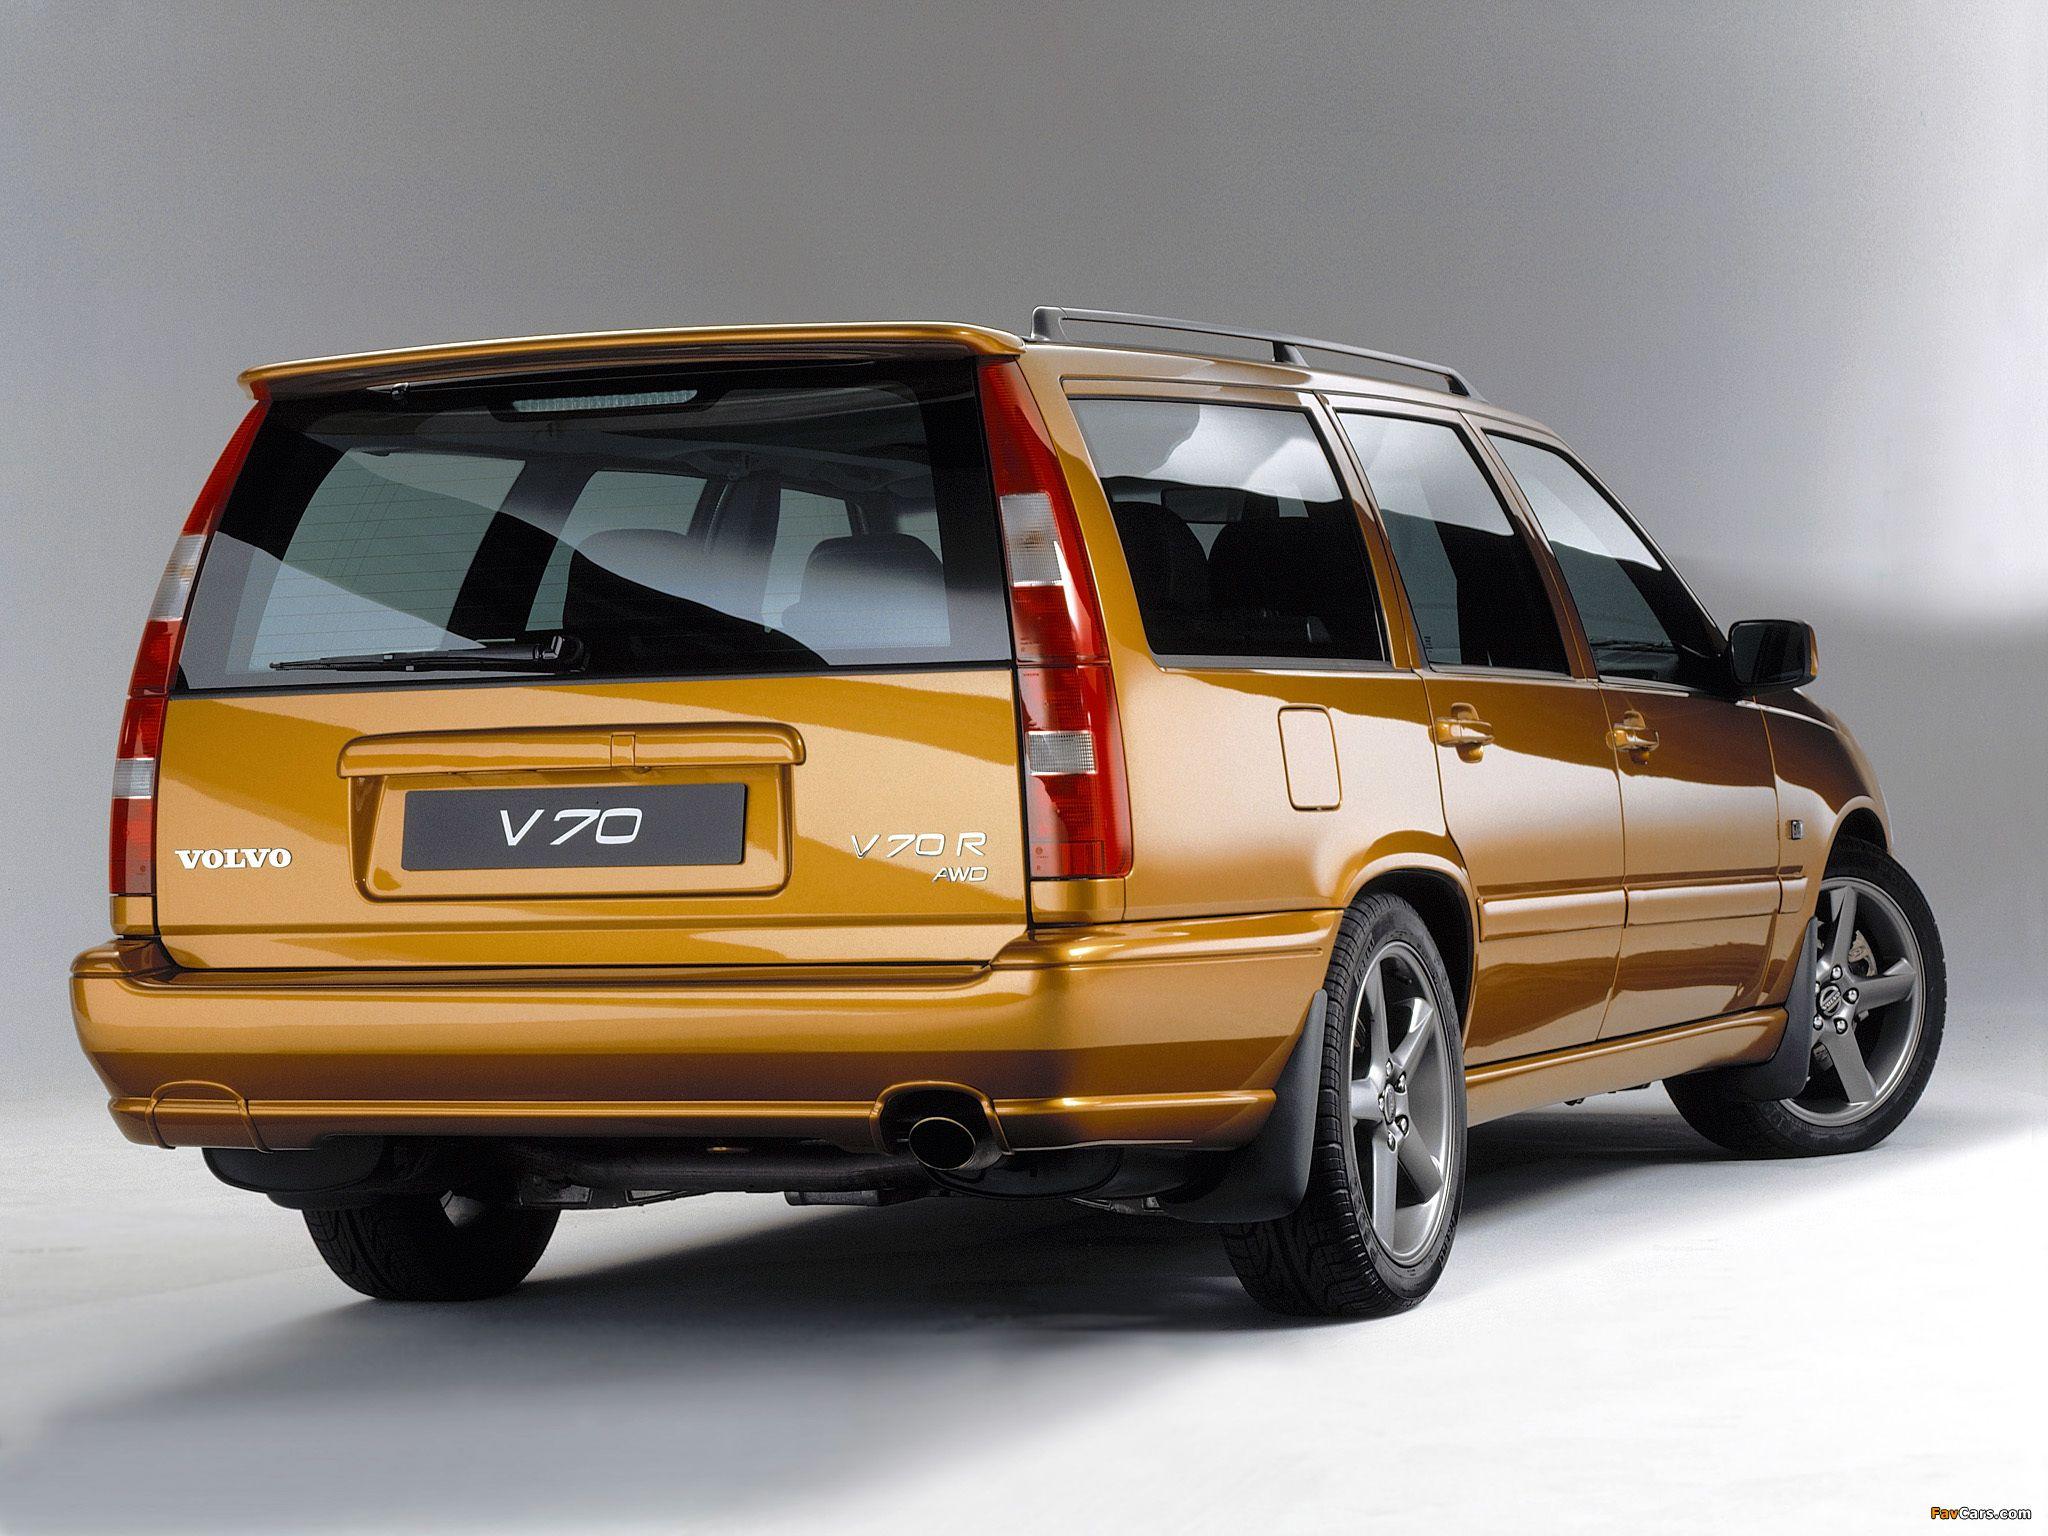 A B D F D C Cd Df on 1998 Volvo V70 Station Wagon